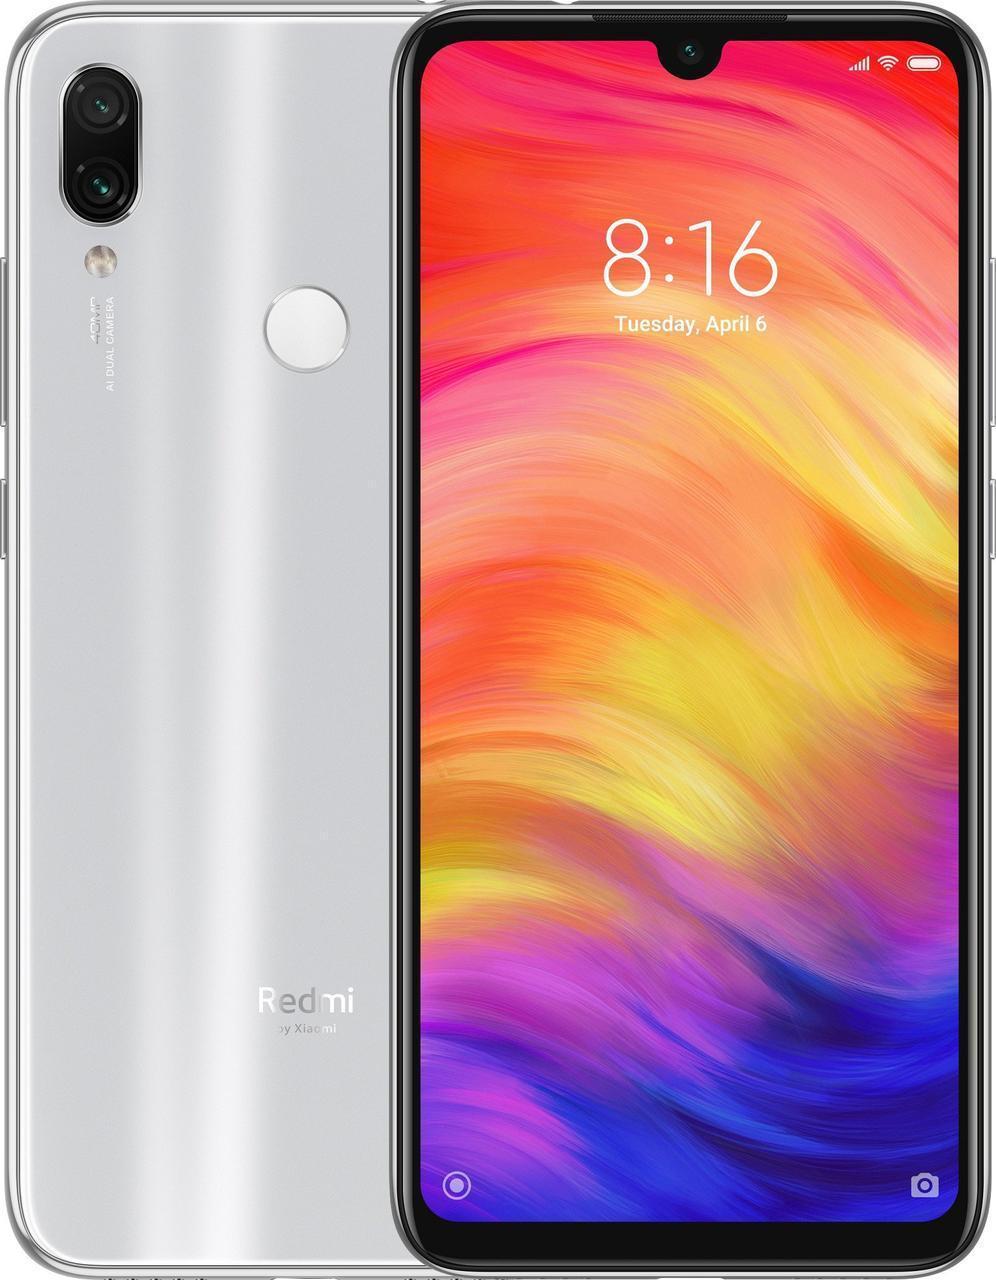 Смартфон Xiaomi Redmi Note 7 4/64Gb Moonlight White UA-UCRF Гарантия 1 год